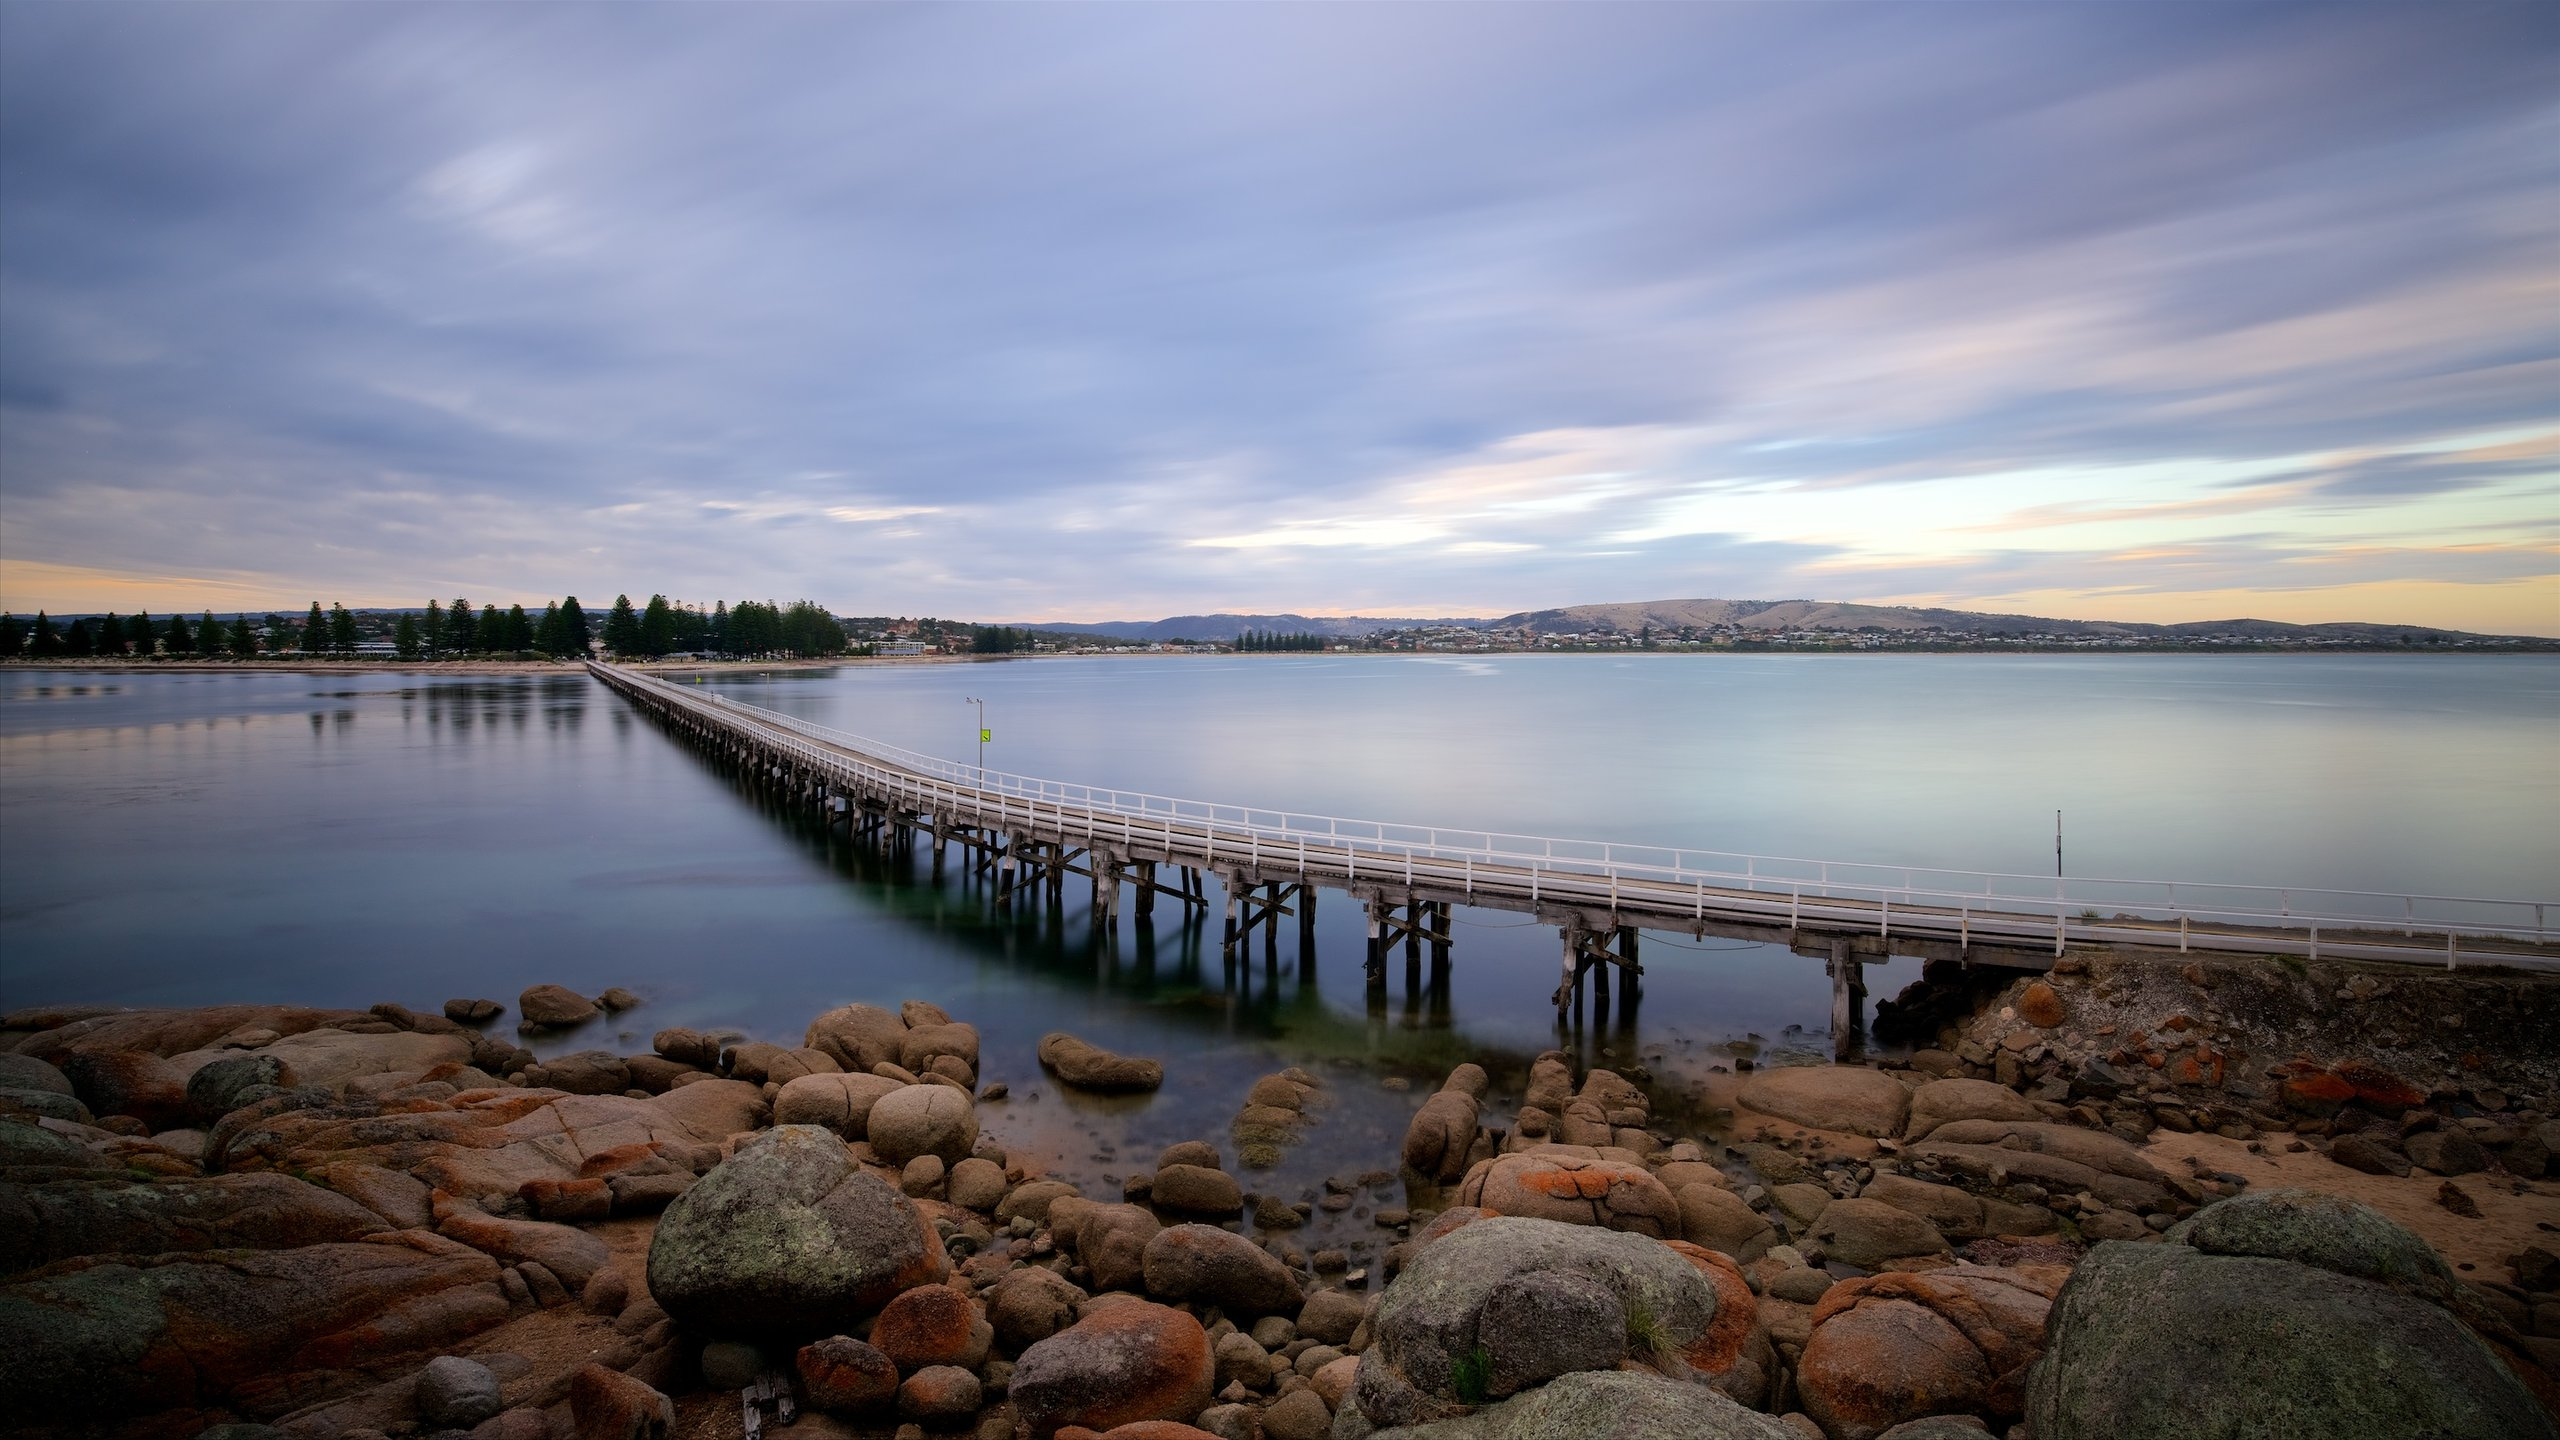 Fleurieu Peninsula, South Australia, Australia